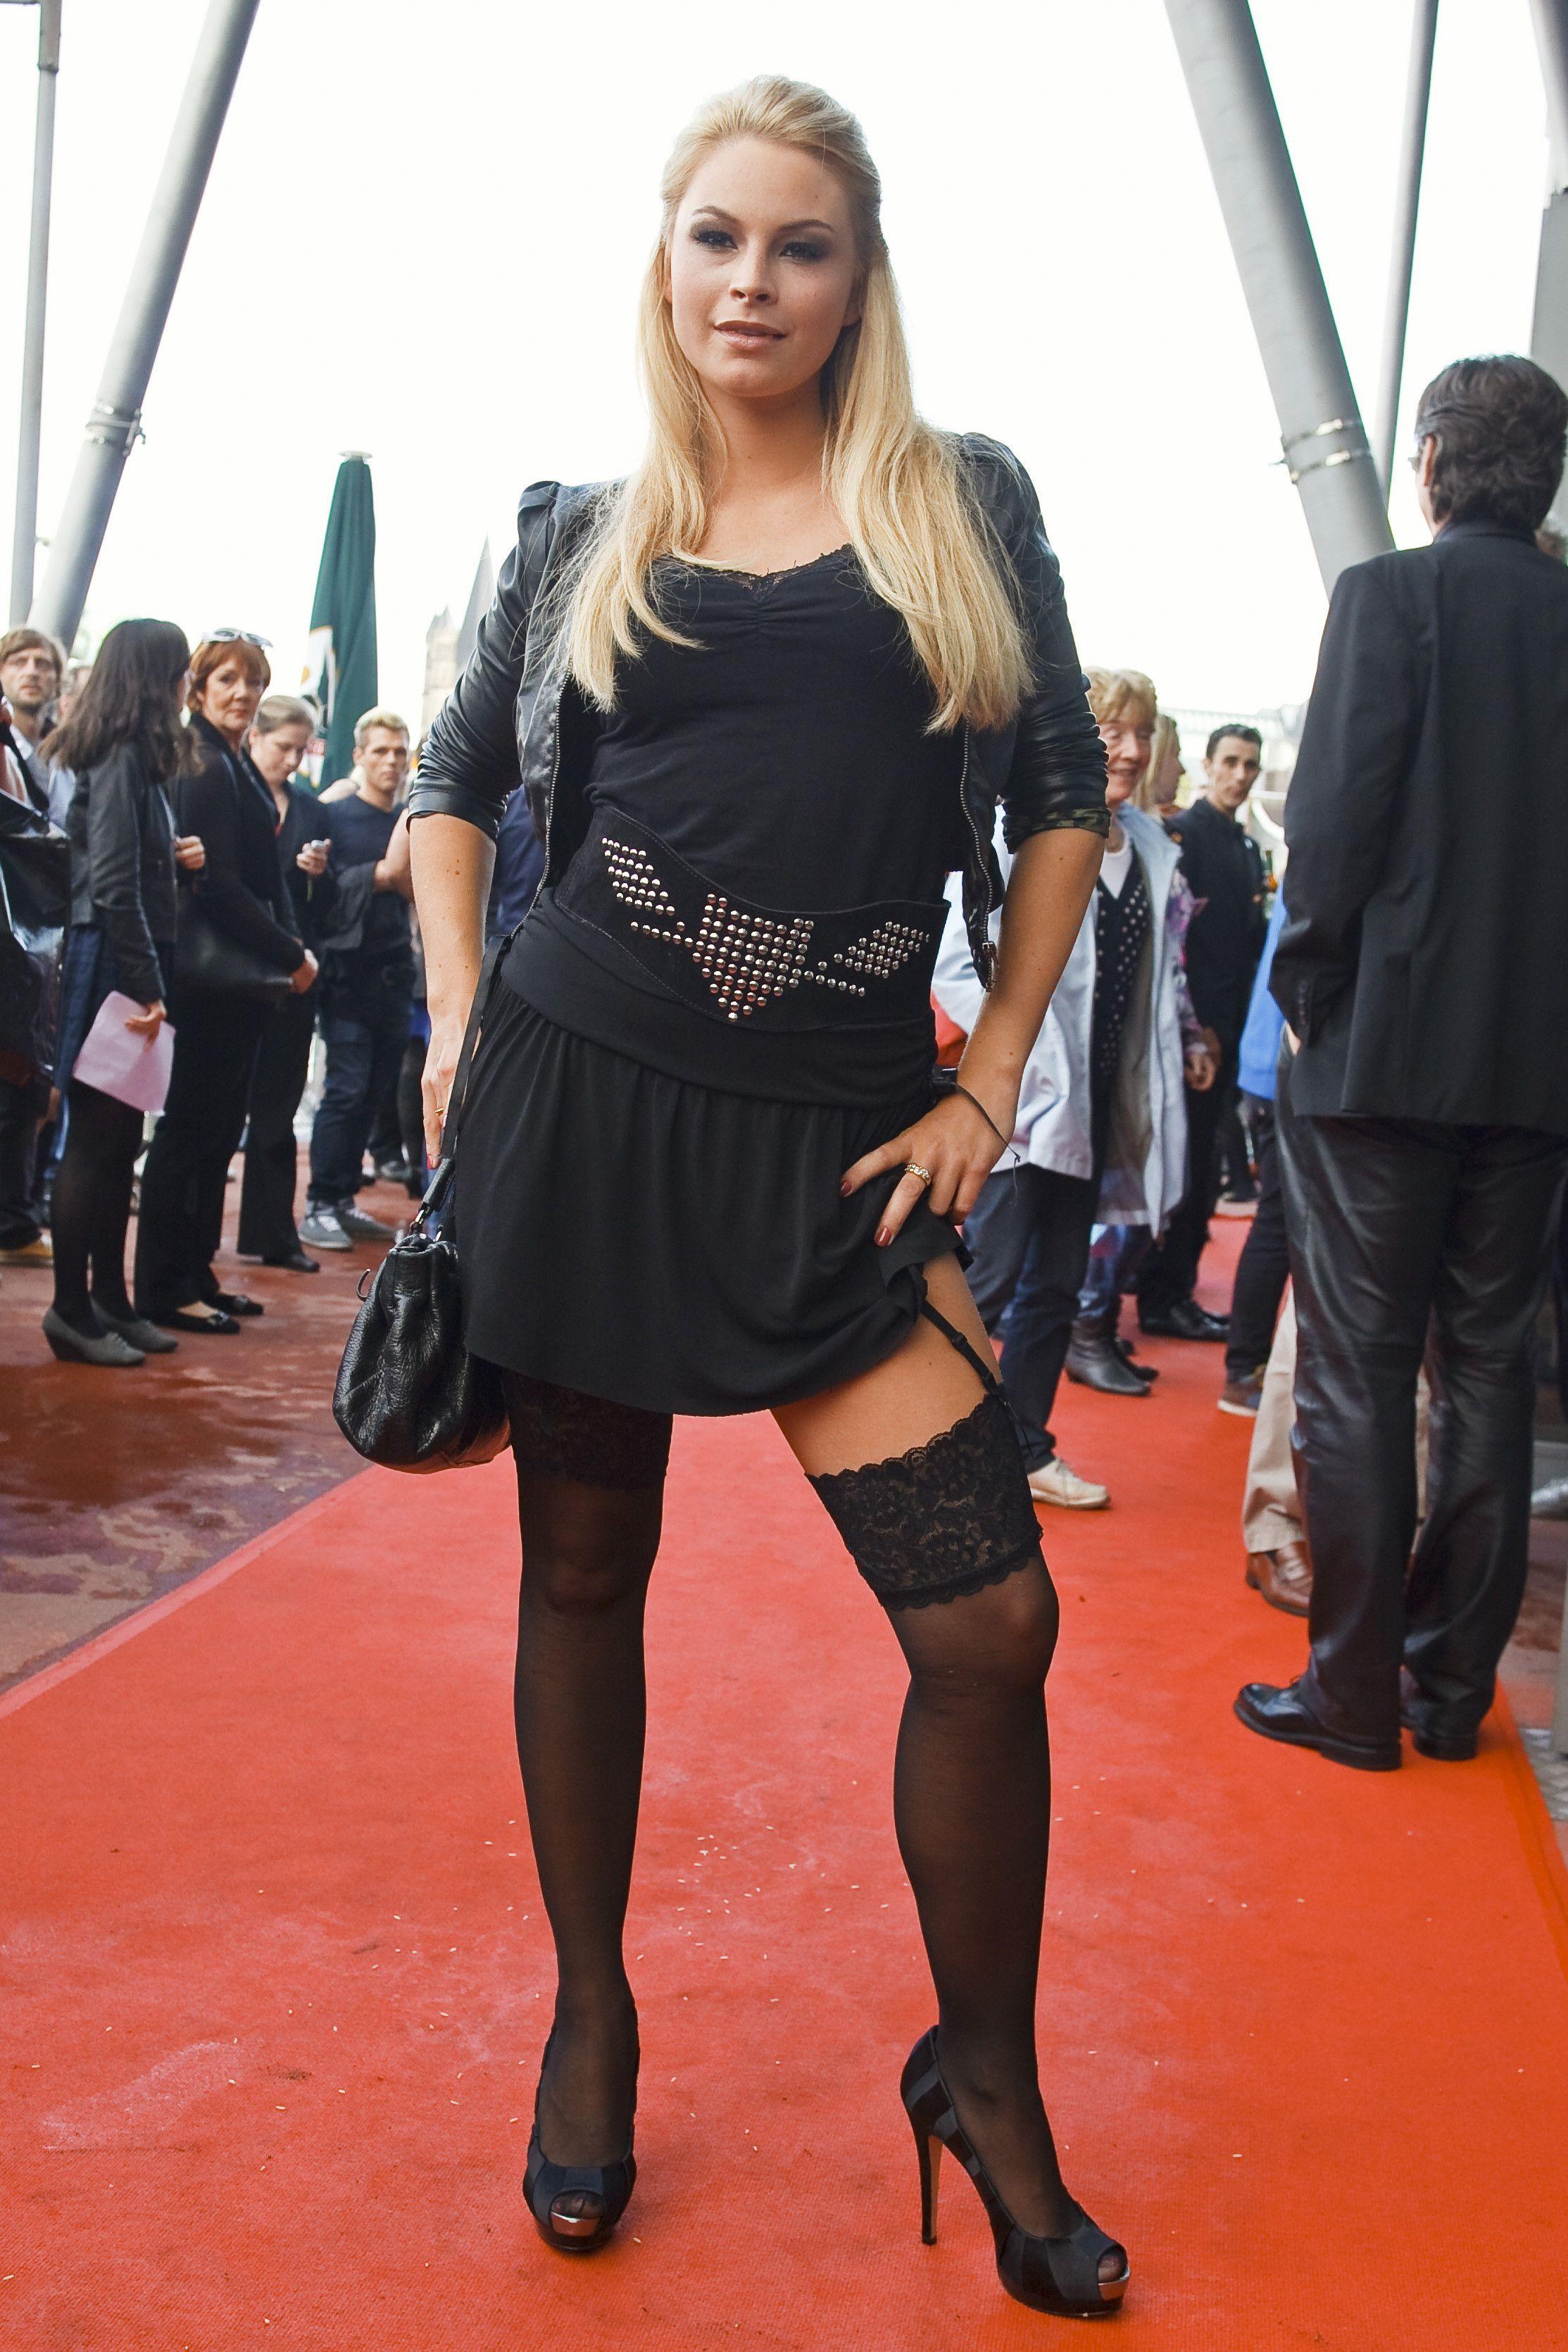 Jana Kilka